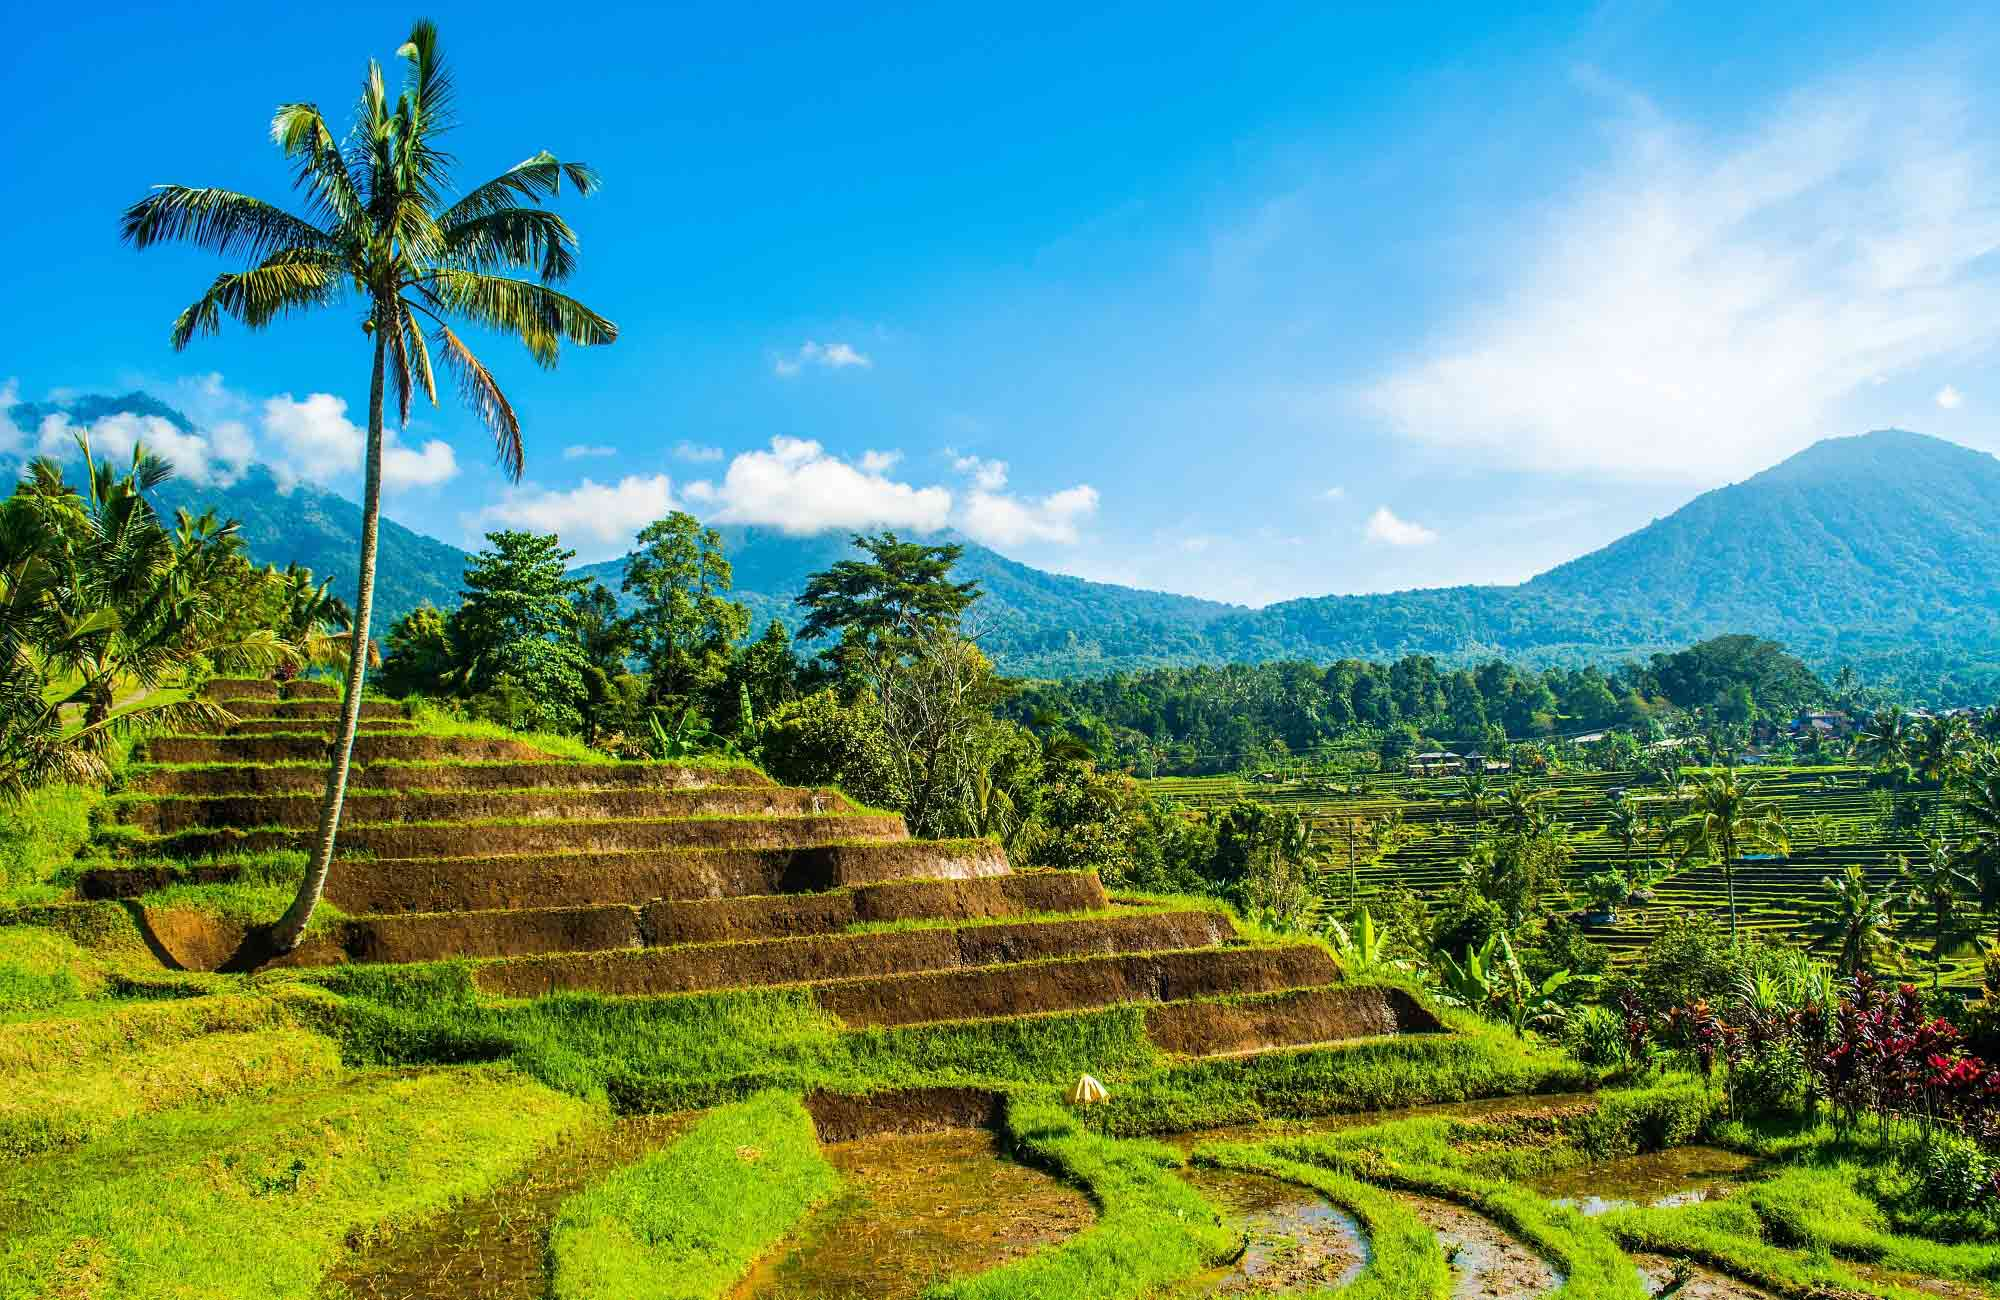 Voyage Indonésie - Bali rizières - Amplitudes